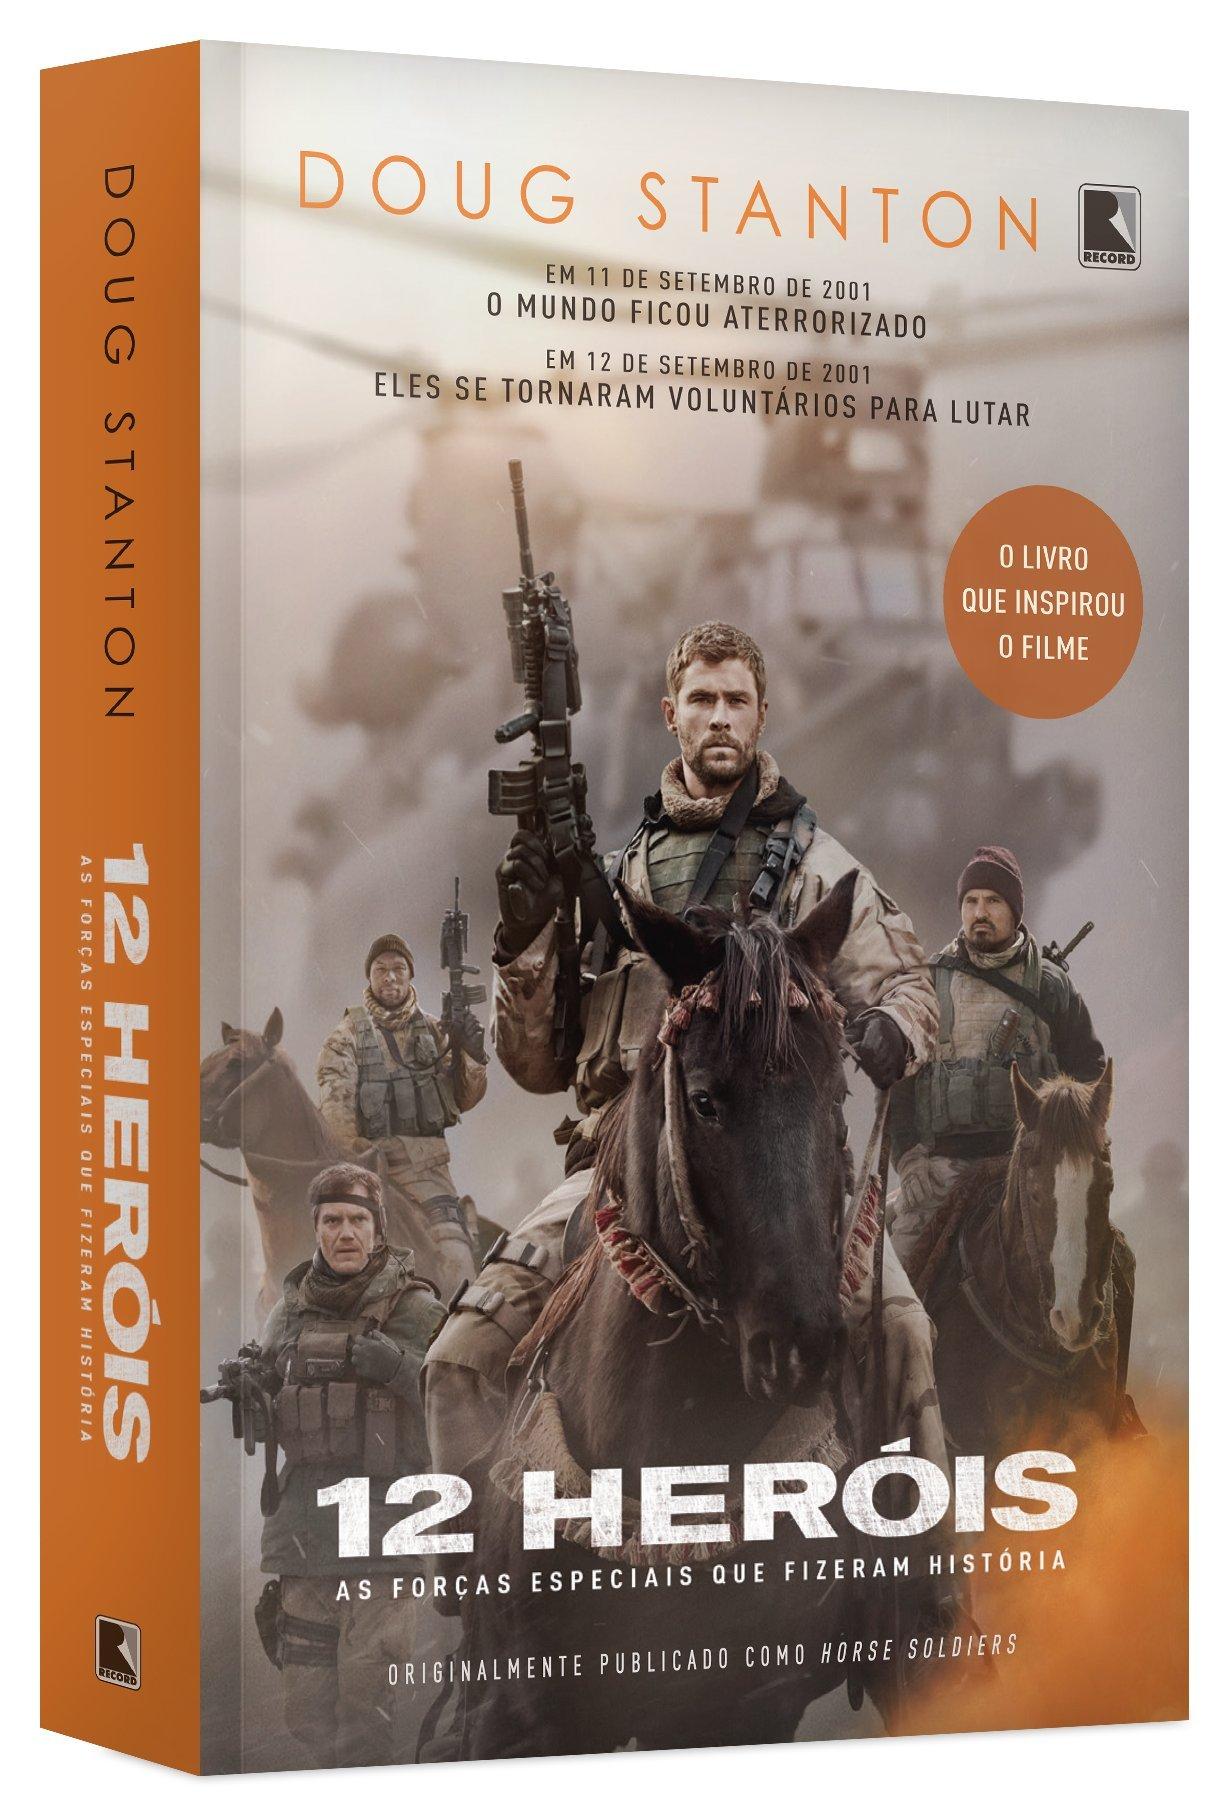 12 Herois